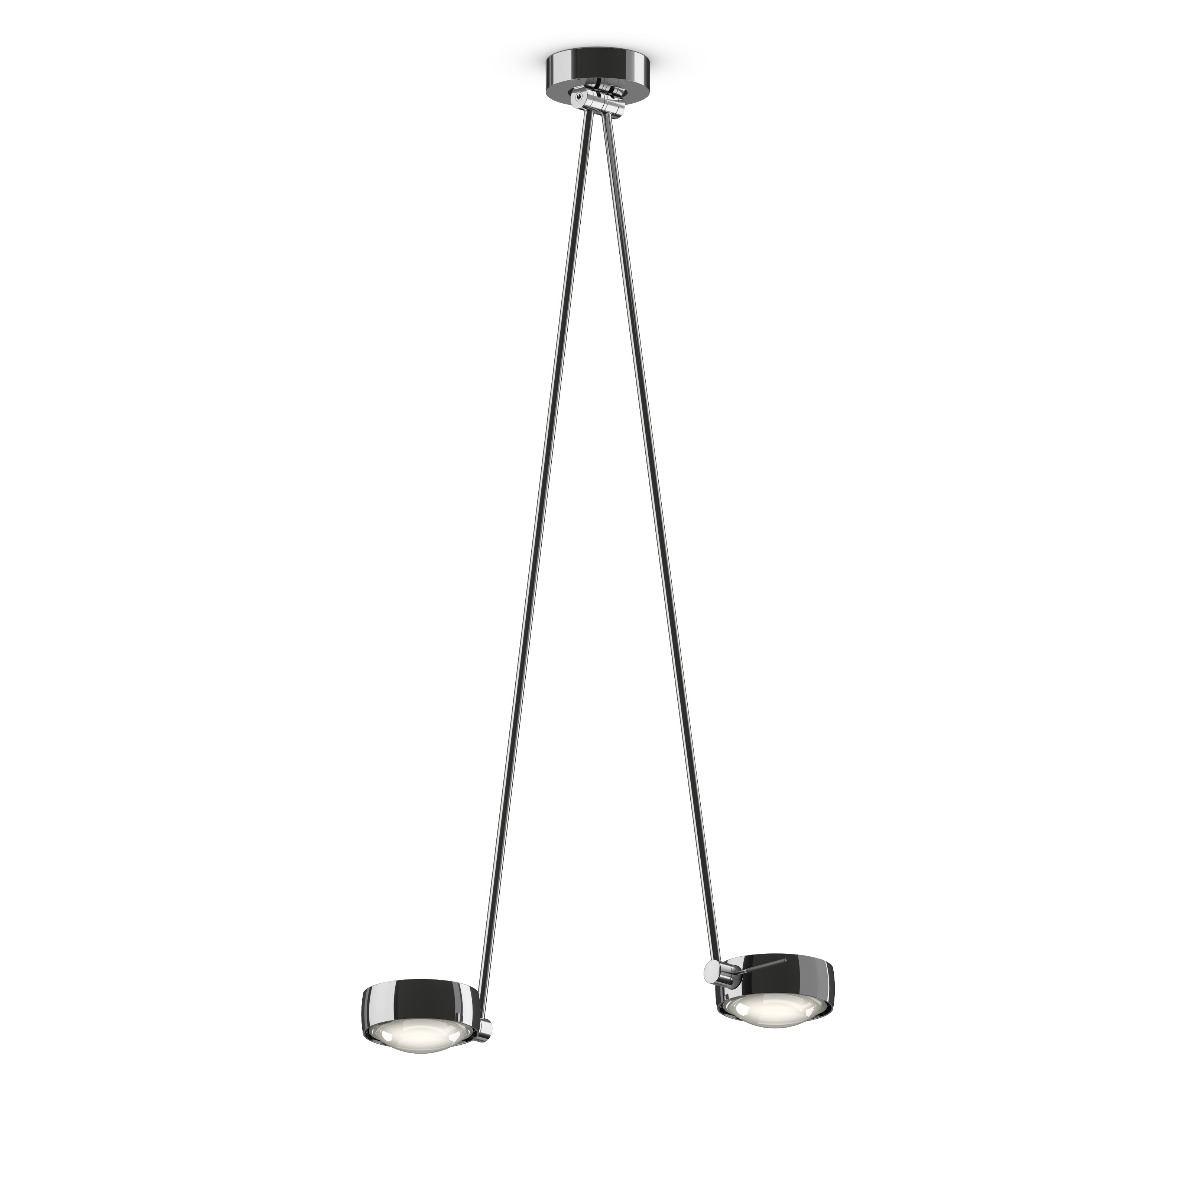 Occhio Sento soffitto due up 100 LED-Deckenleuchte